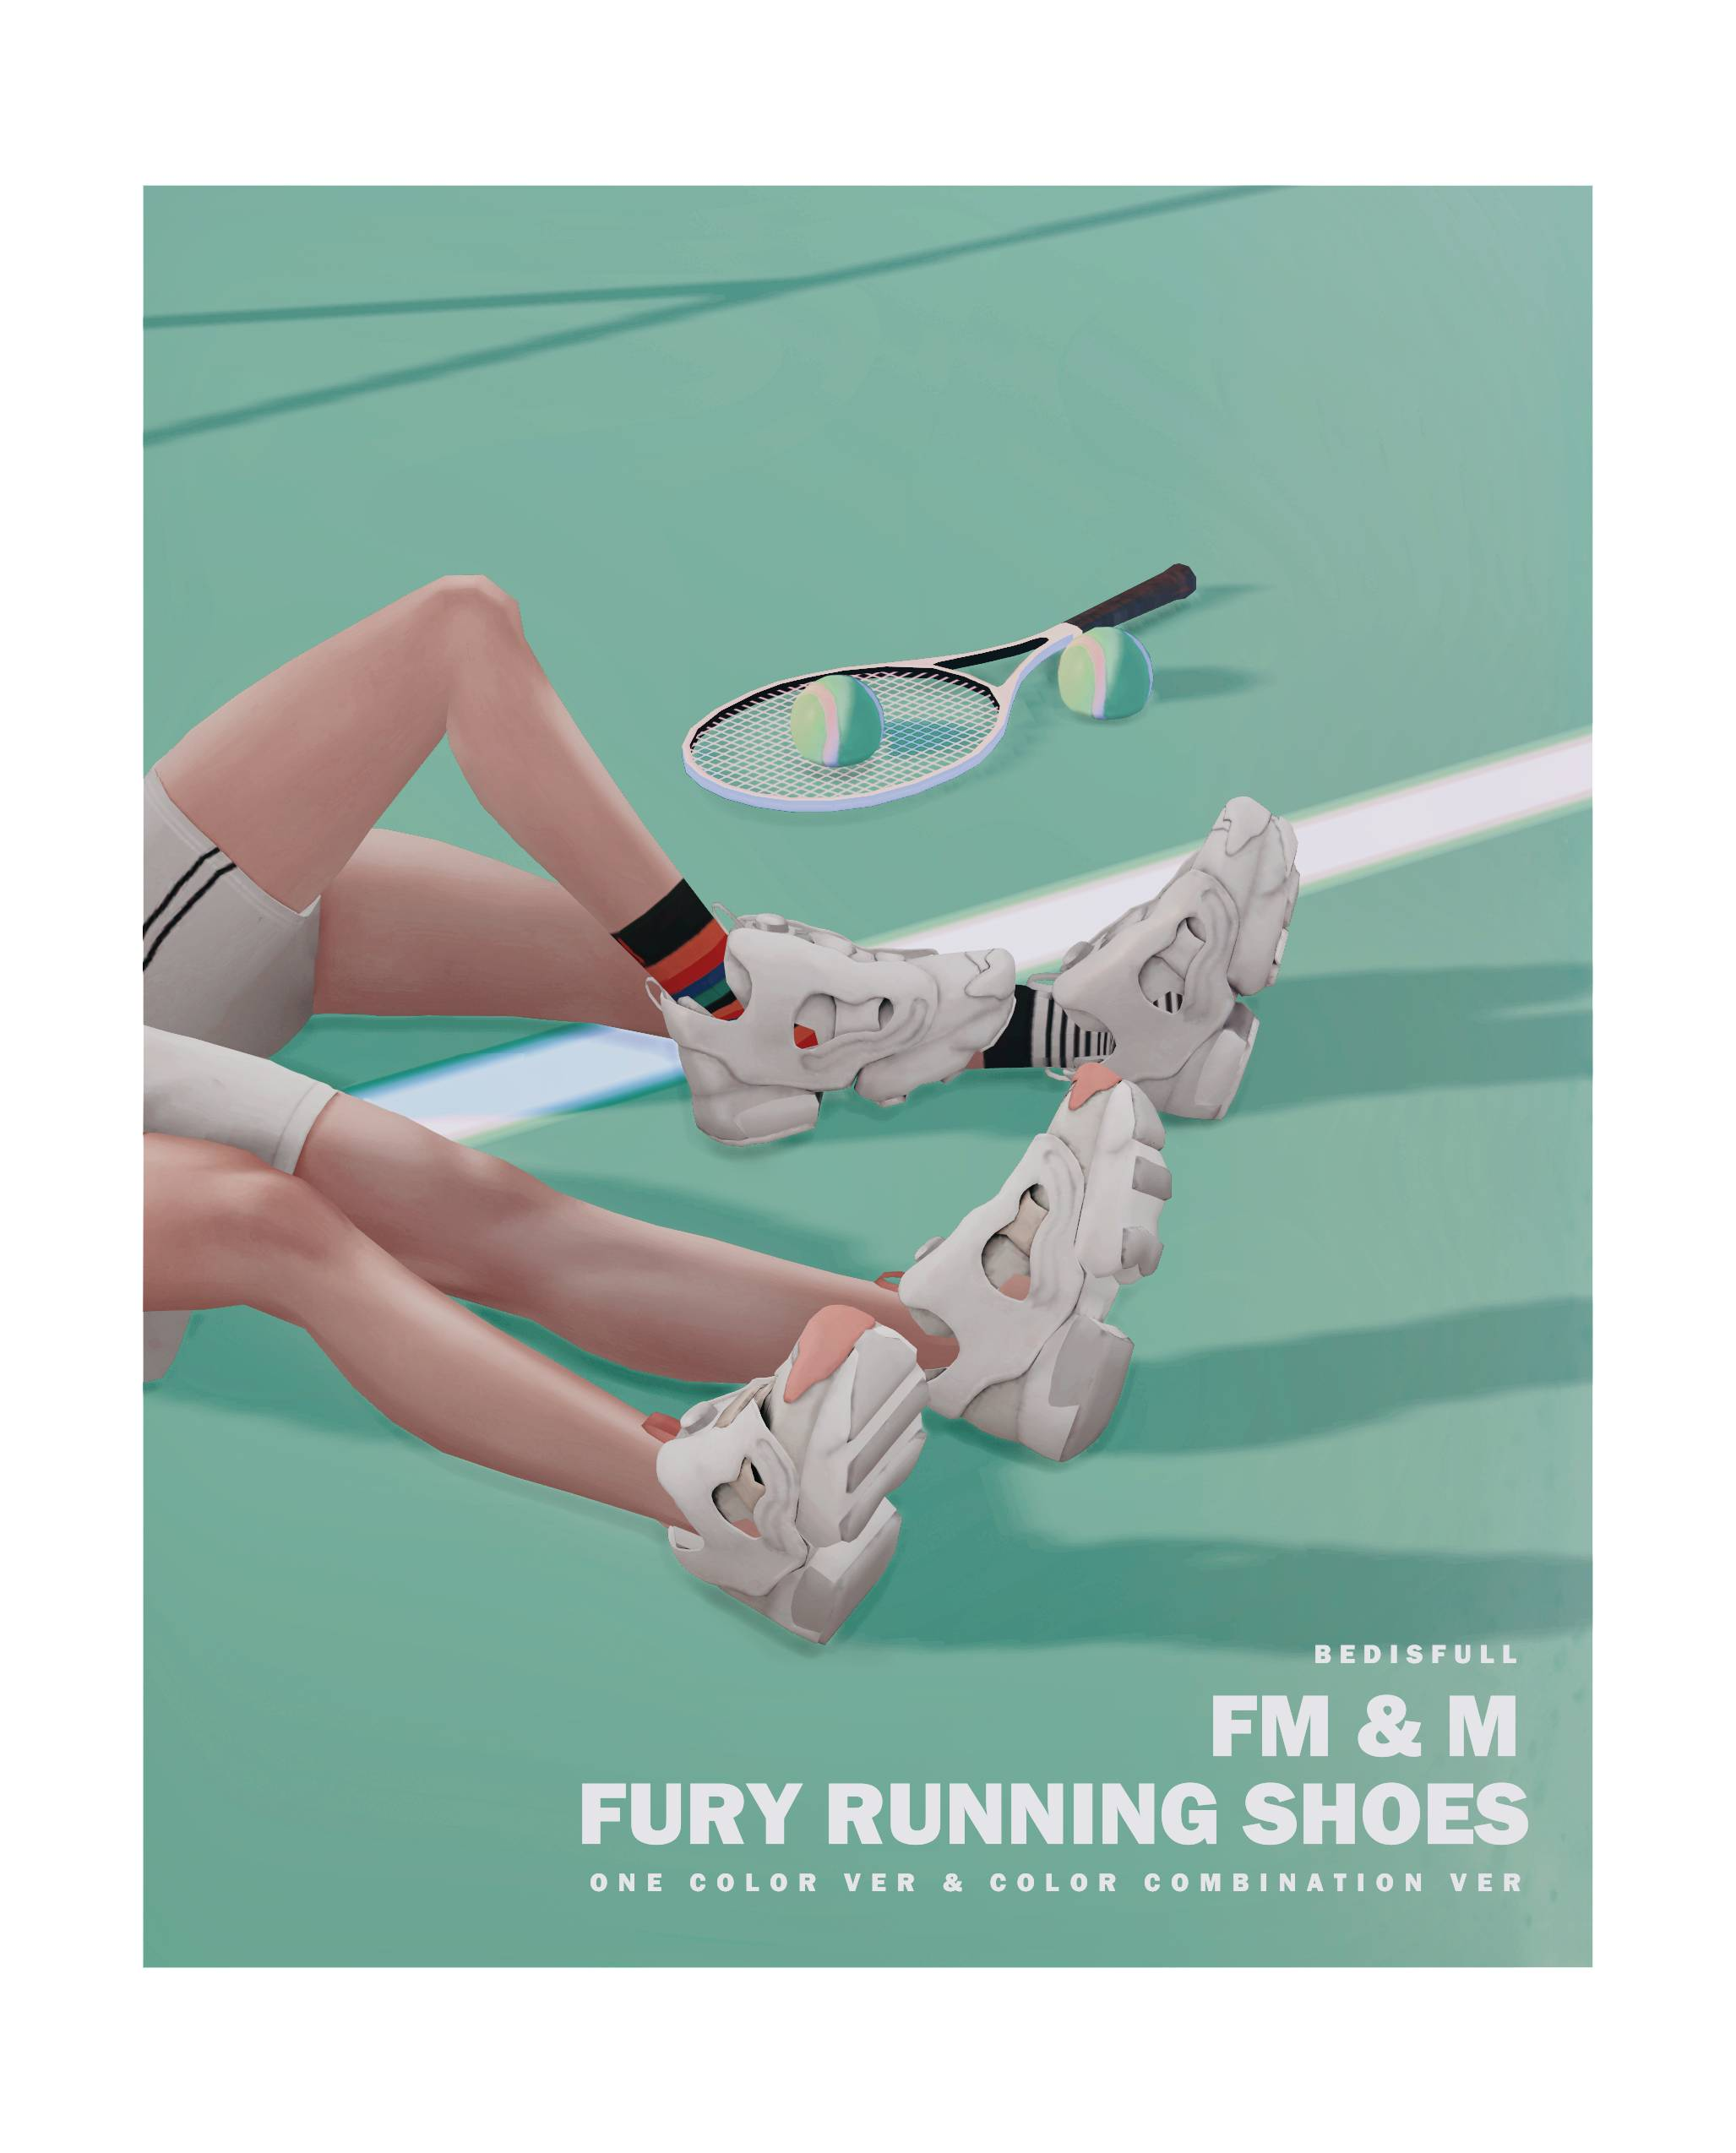 Кроссовки - Fury running shoes